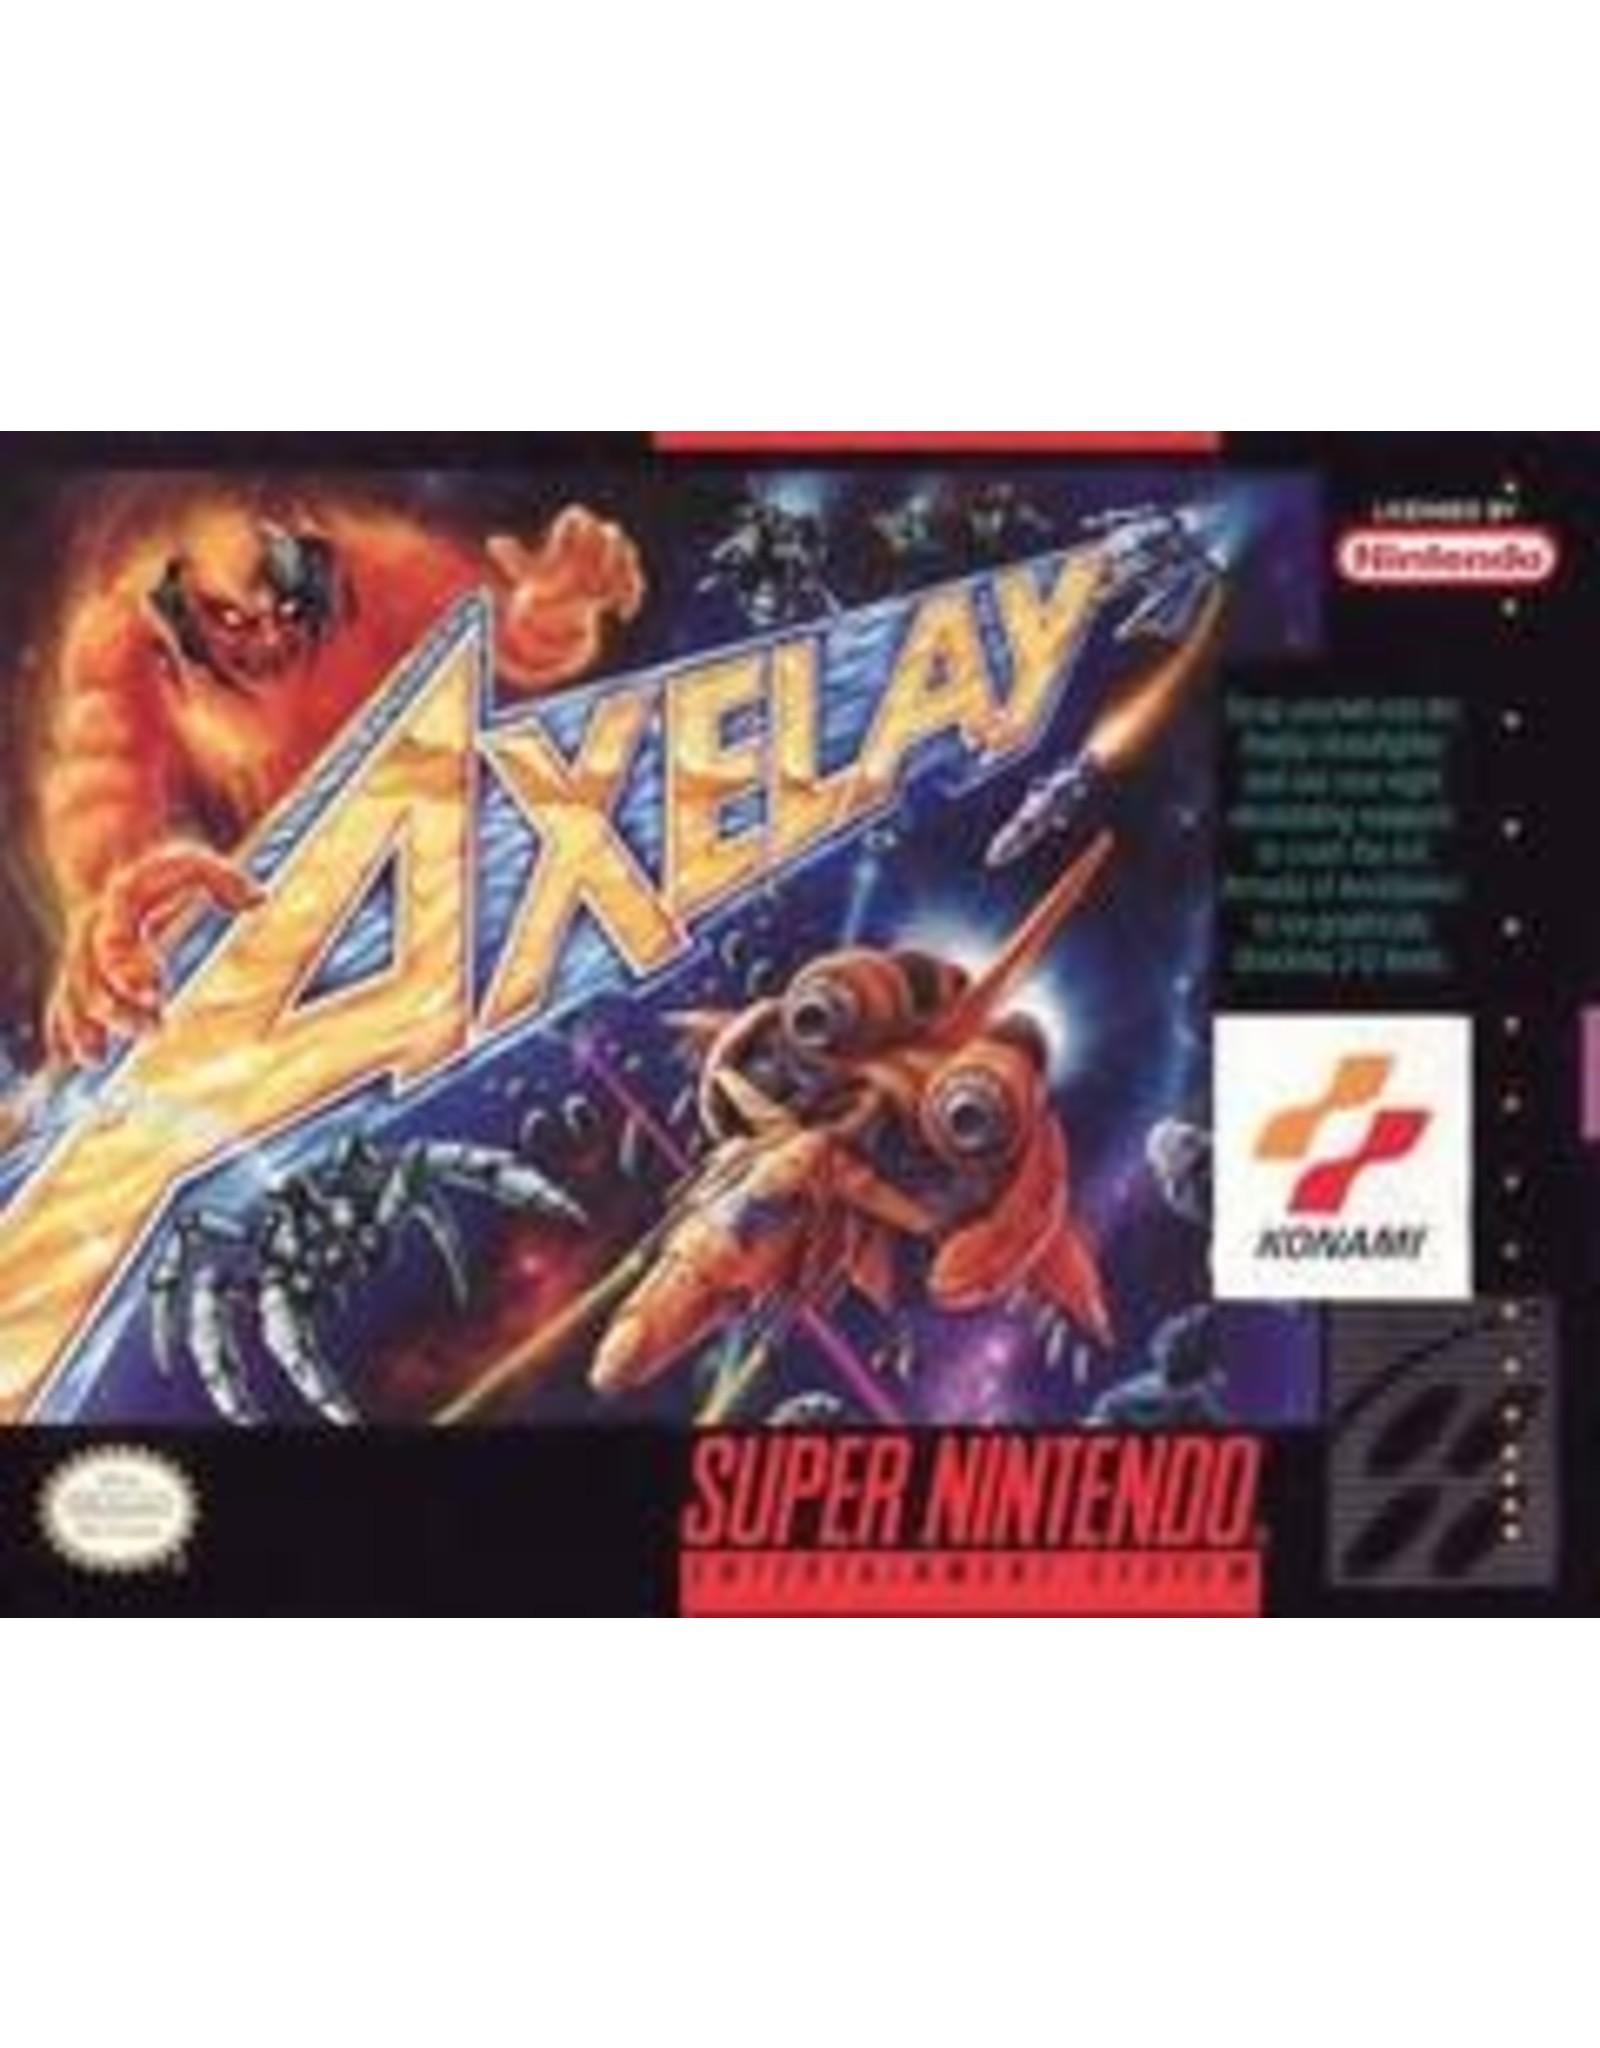 Super Nintendo Axelay (Cart Only, Minor Label Damage, Discoloured Cart Back)